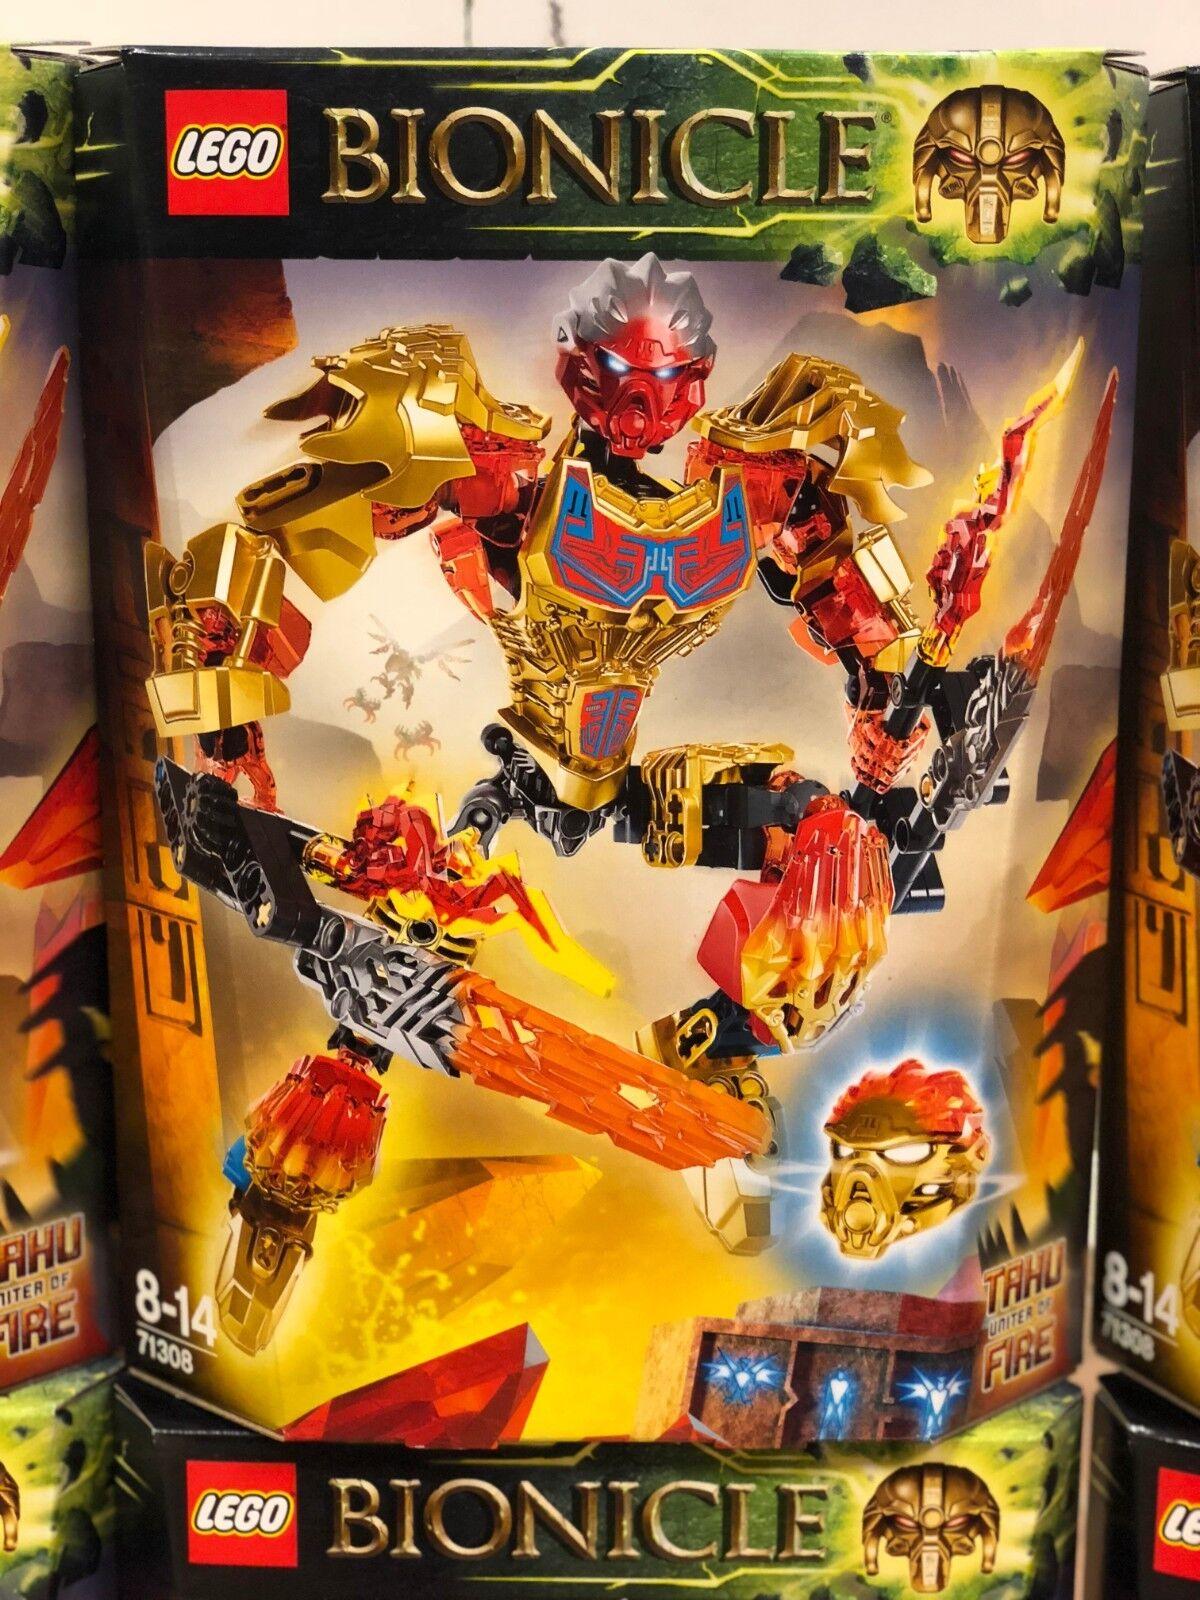 New and sealed Lego Bionicle Bionicle Bionicle Tahu uniter of fire 71308 e49120